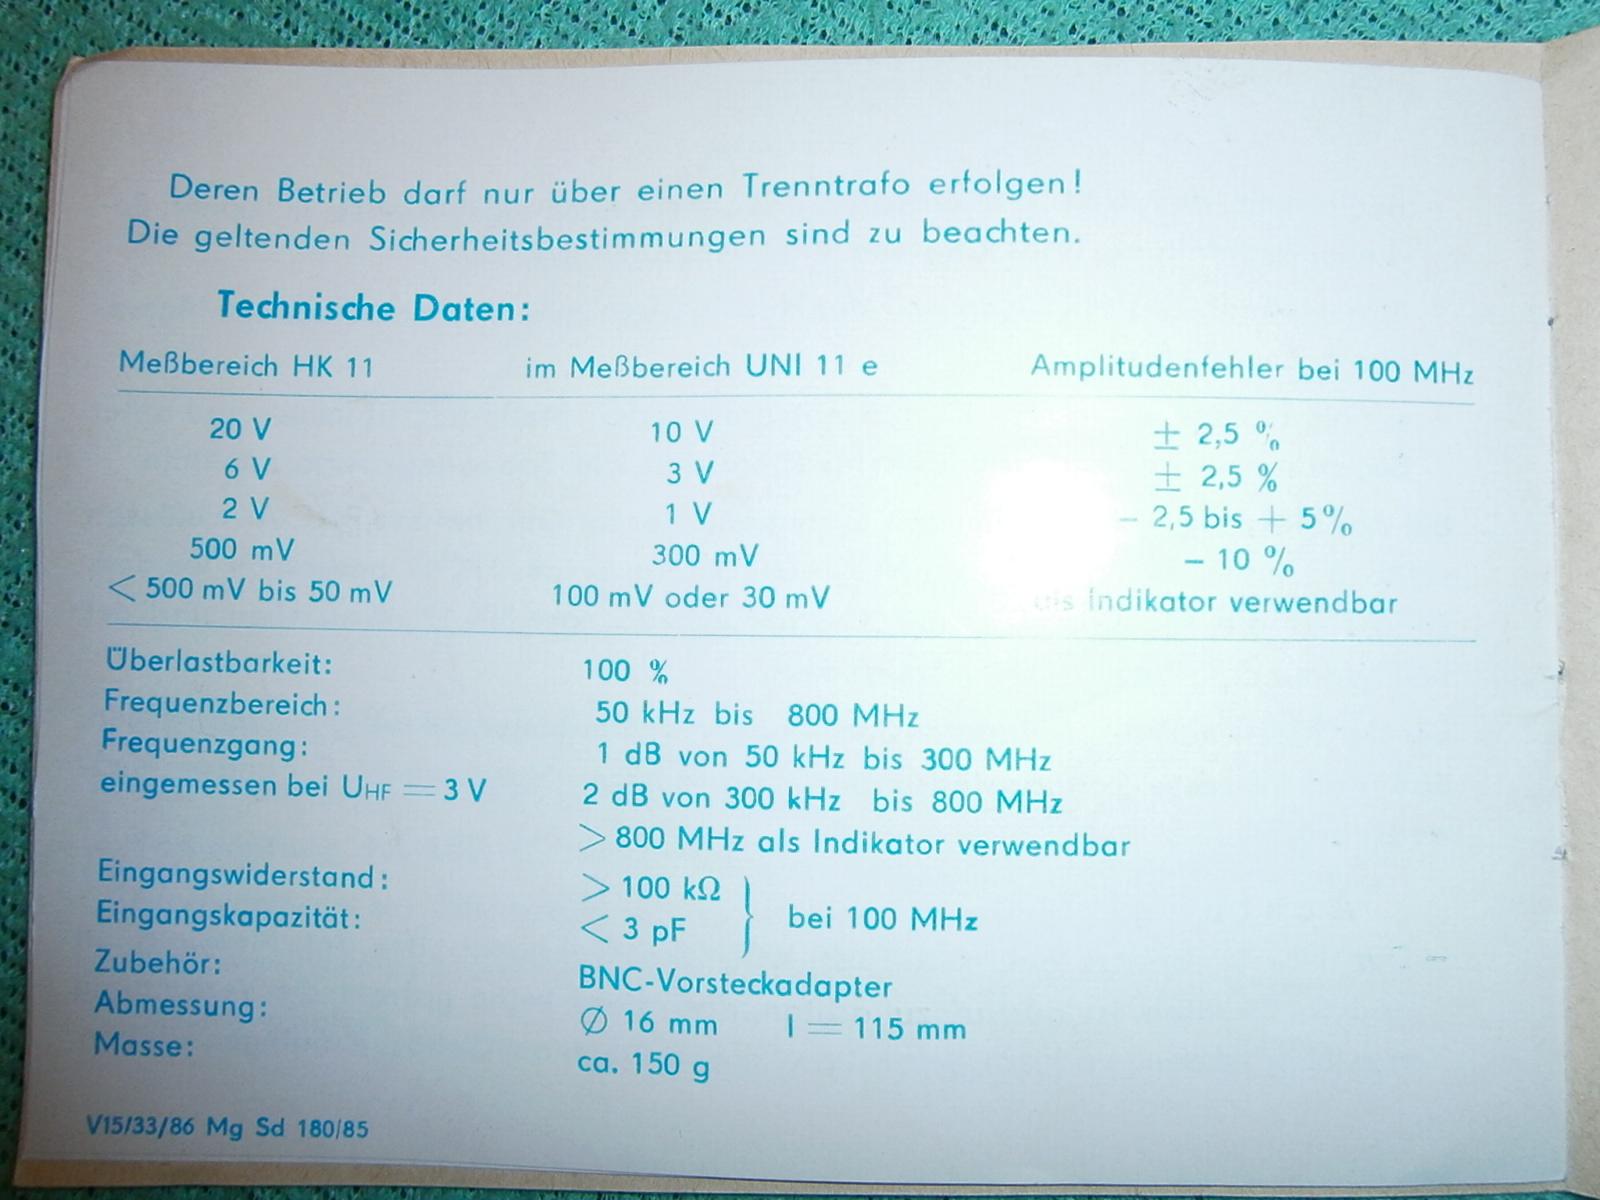 Baofeng UV-3R - minimalna moc w pa�mie UHF, VHF w porz�dku